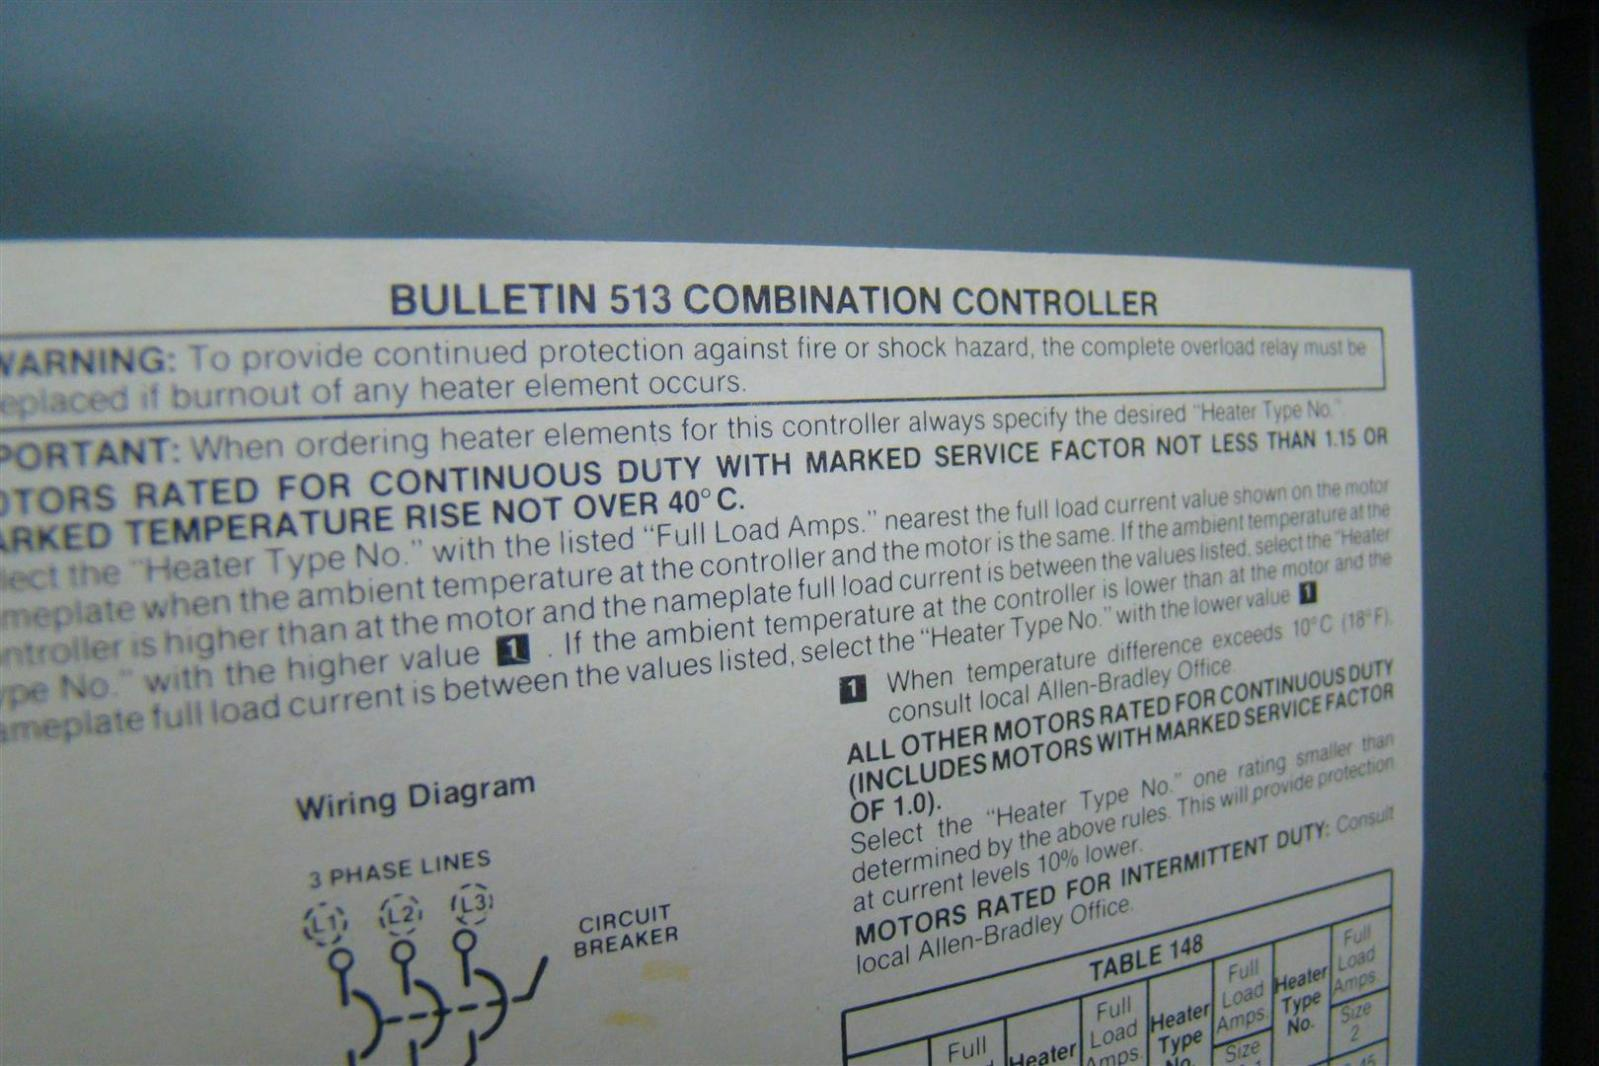 Allen Bradley Bulletin 513 Combination Starter Size 0 W Circuit Motor Controller Wiring Diagram Breaker